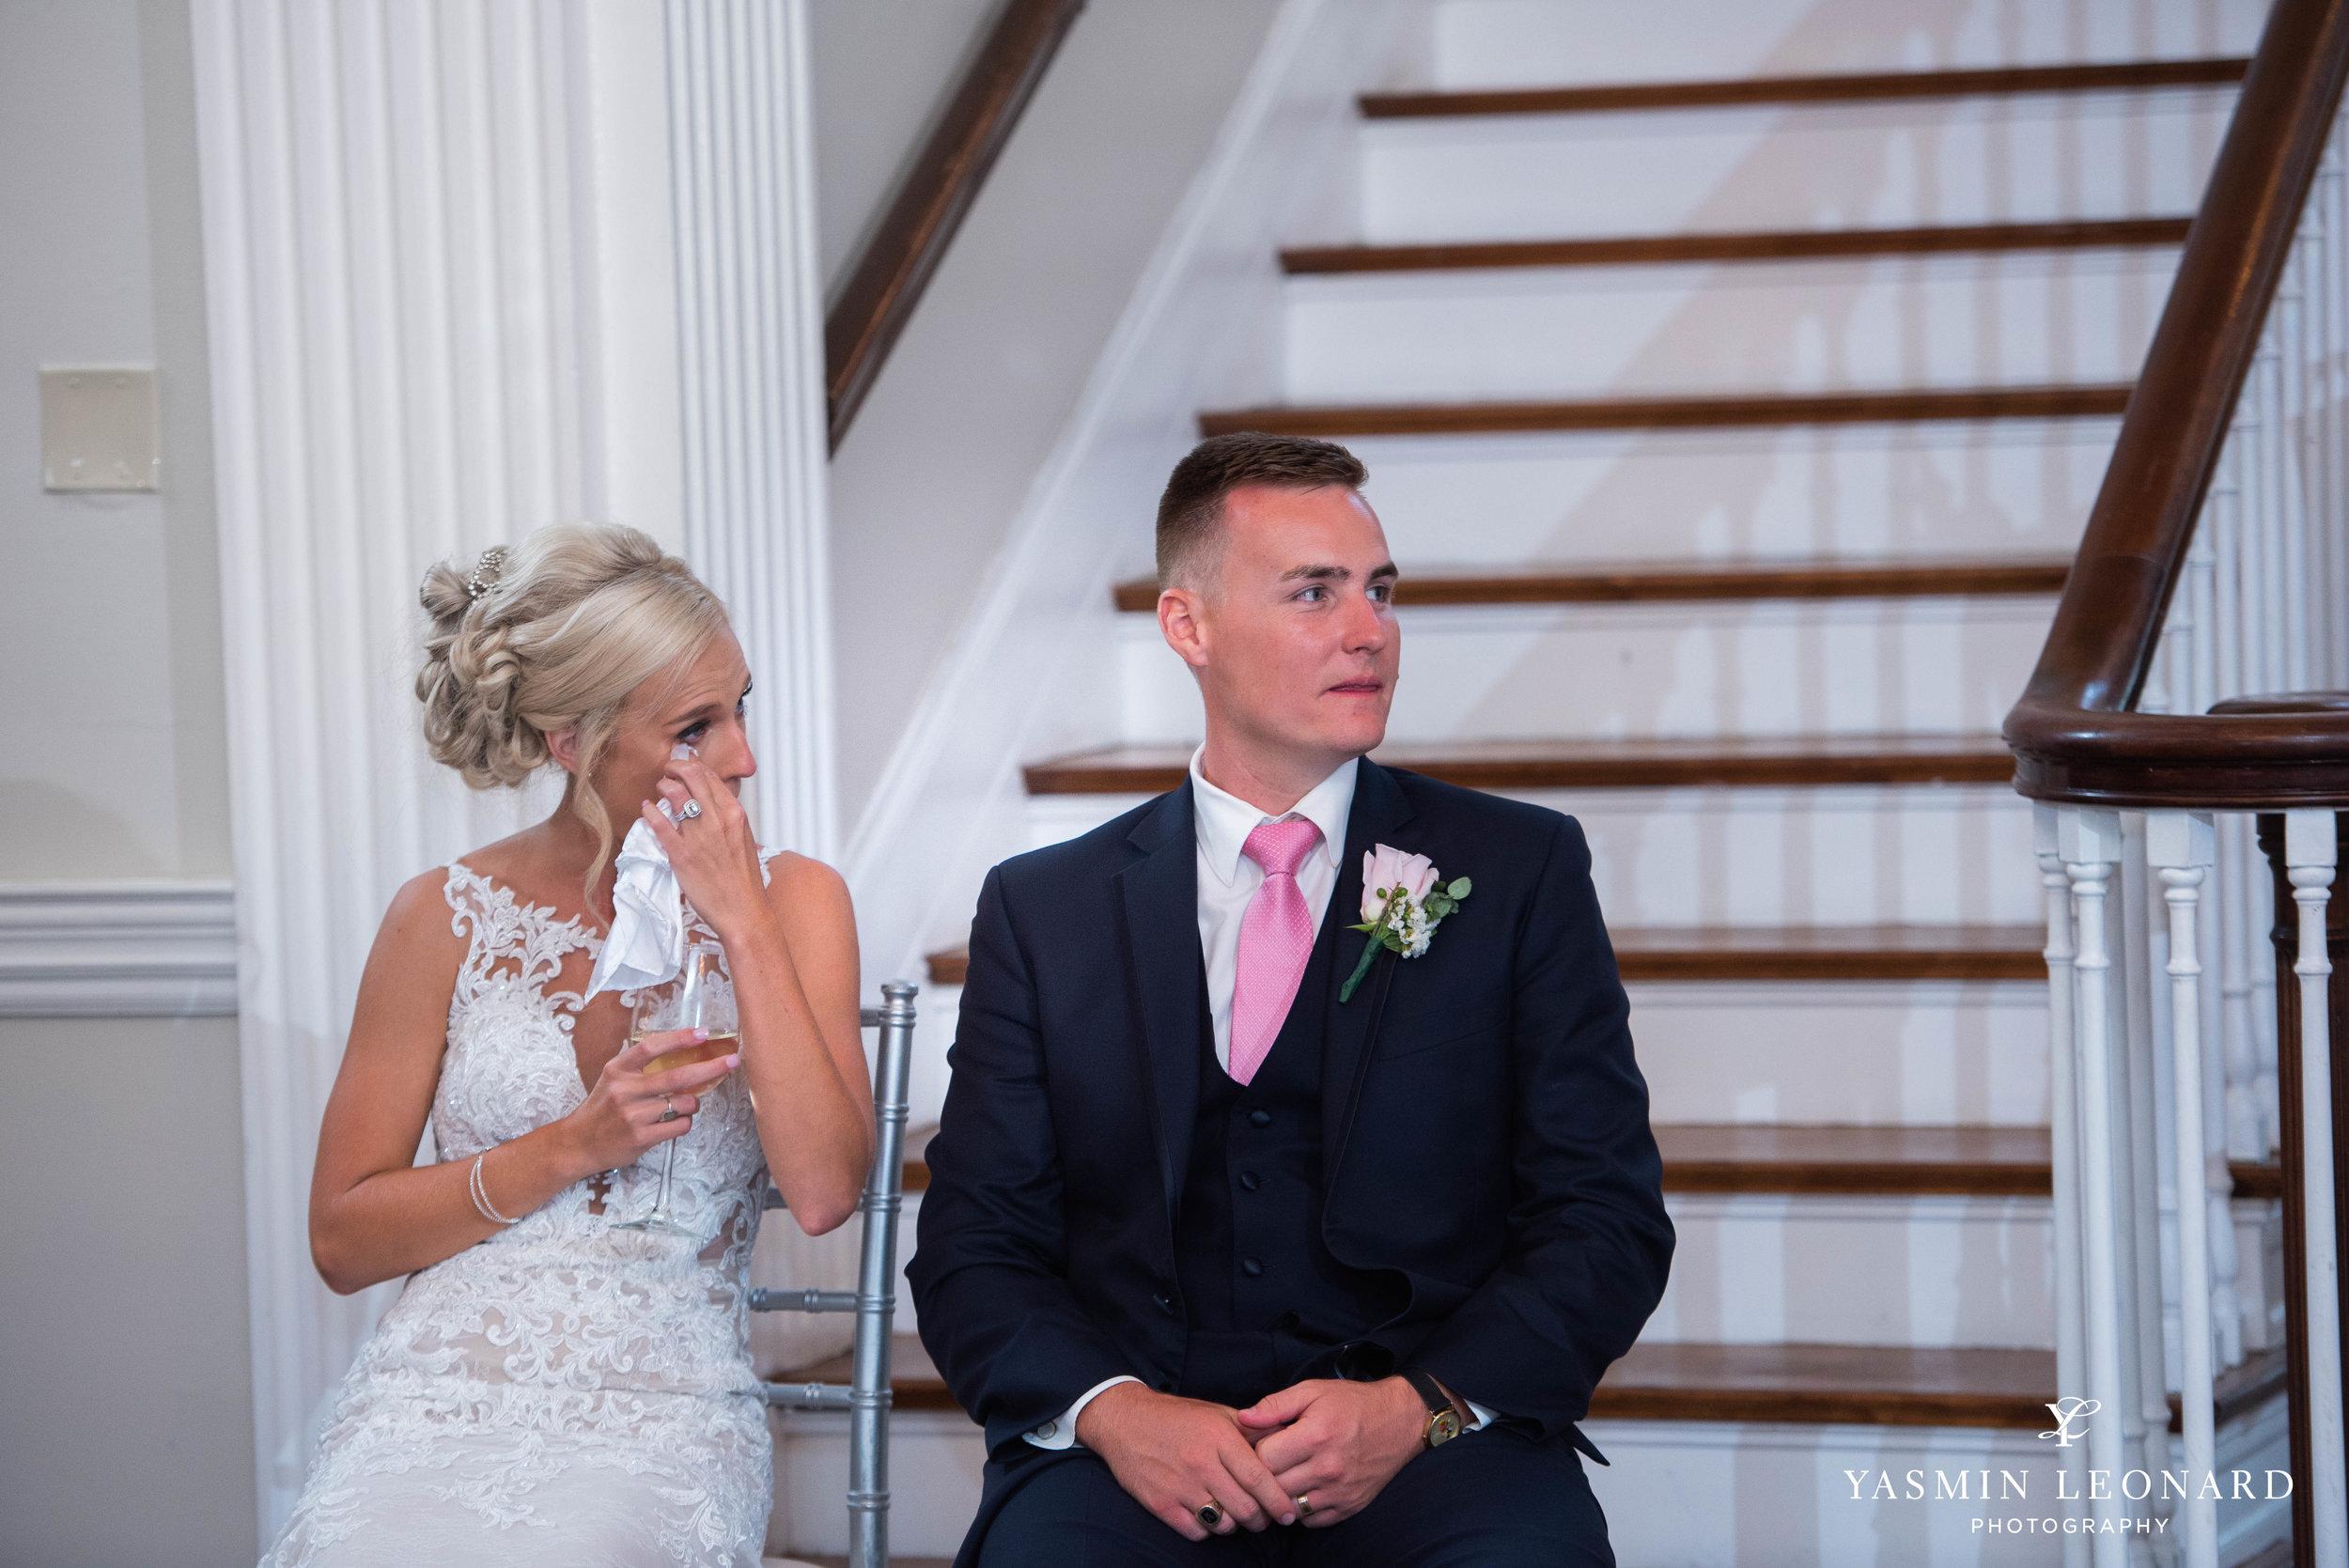 Separk Mansion - NC Weddings - Gastonia Wedding - NC Wedding Venues - Pink and Blue Wedding Ideas - Pink Bridesmaid Dresses - Yasmin Leonard Photography-49.jpg